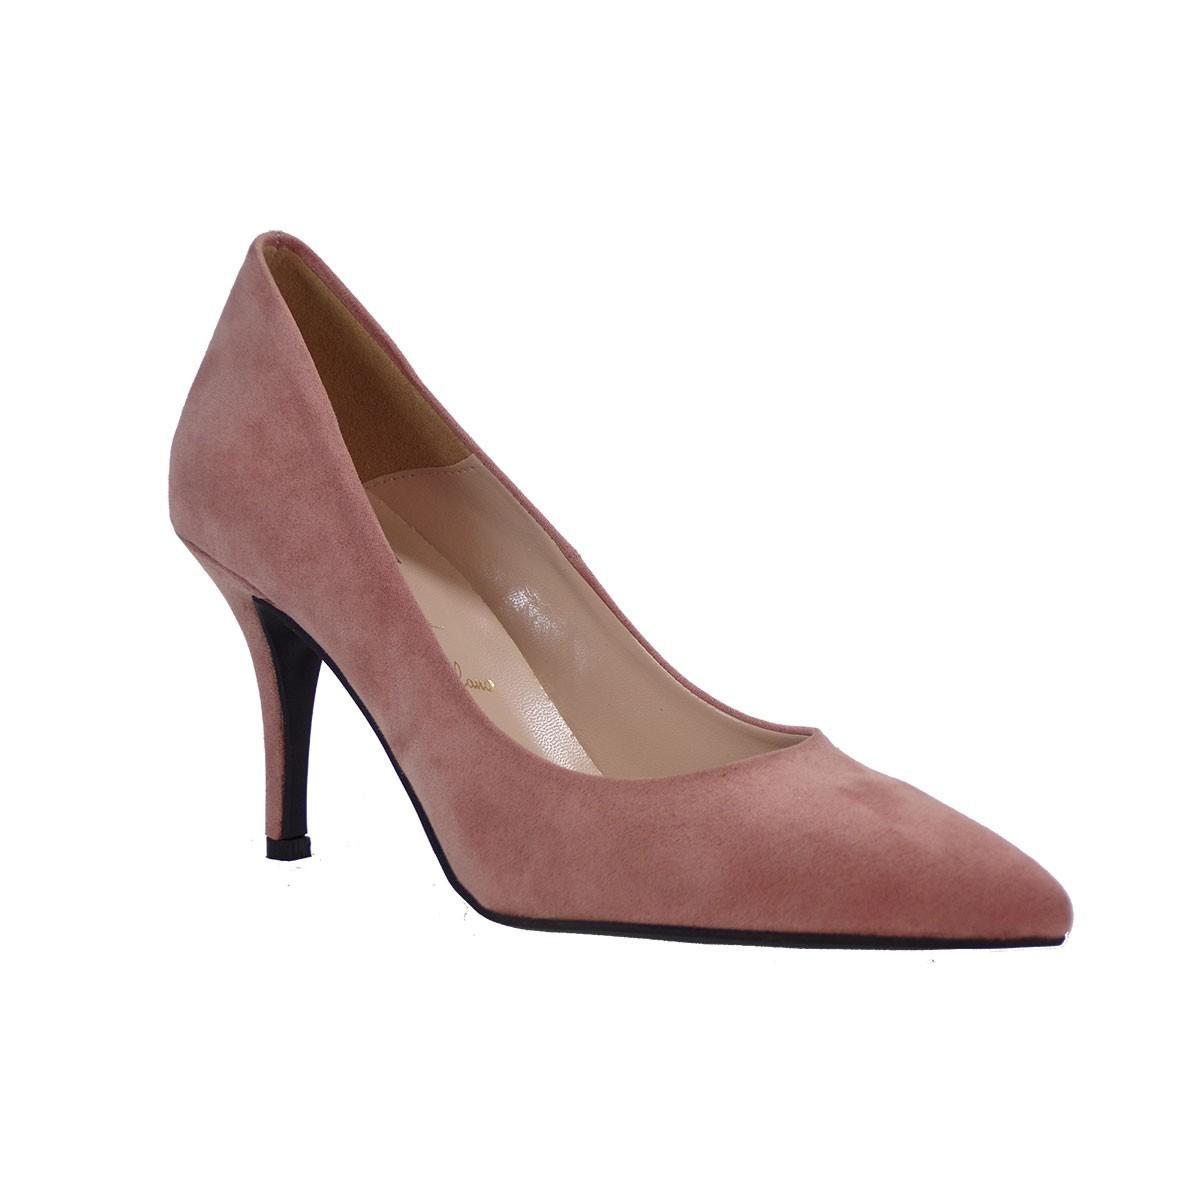 Alessandra Paggioti Γυναικεία Παπούτσια Γόβες 83001 Πούδρα Καστόρι